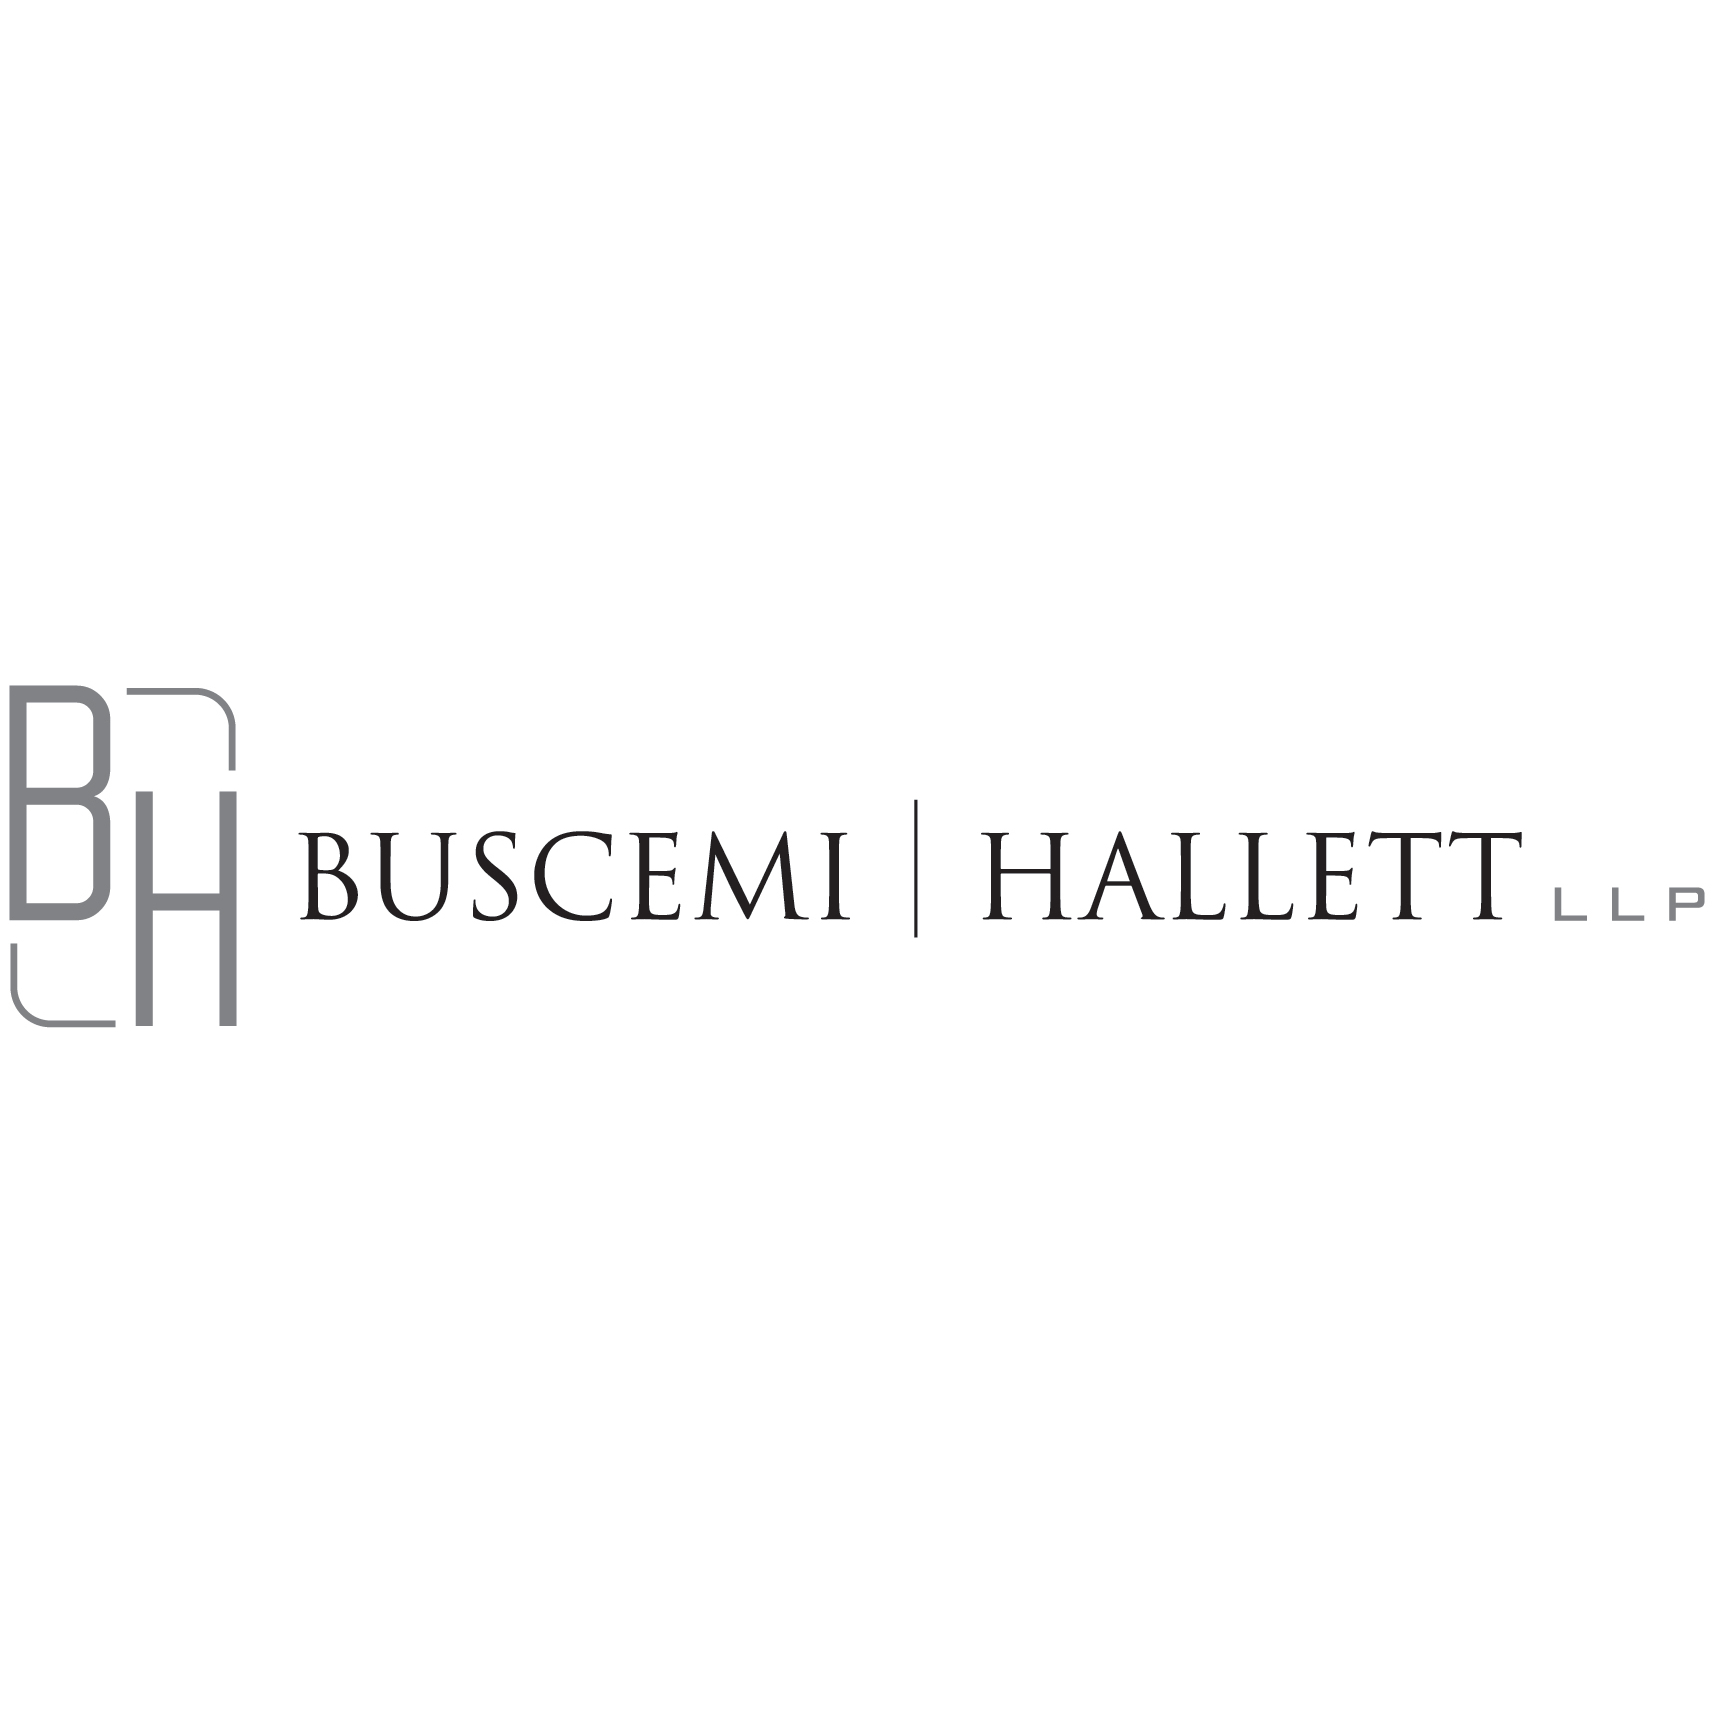 Buscemi Hallett LLP